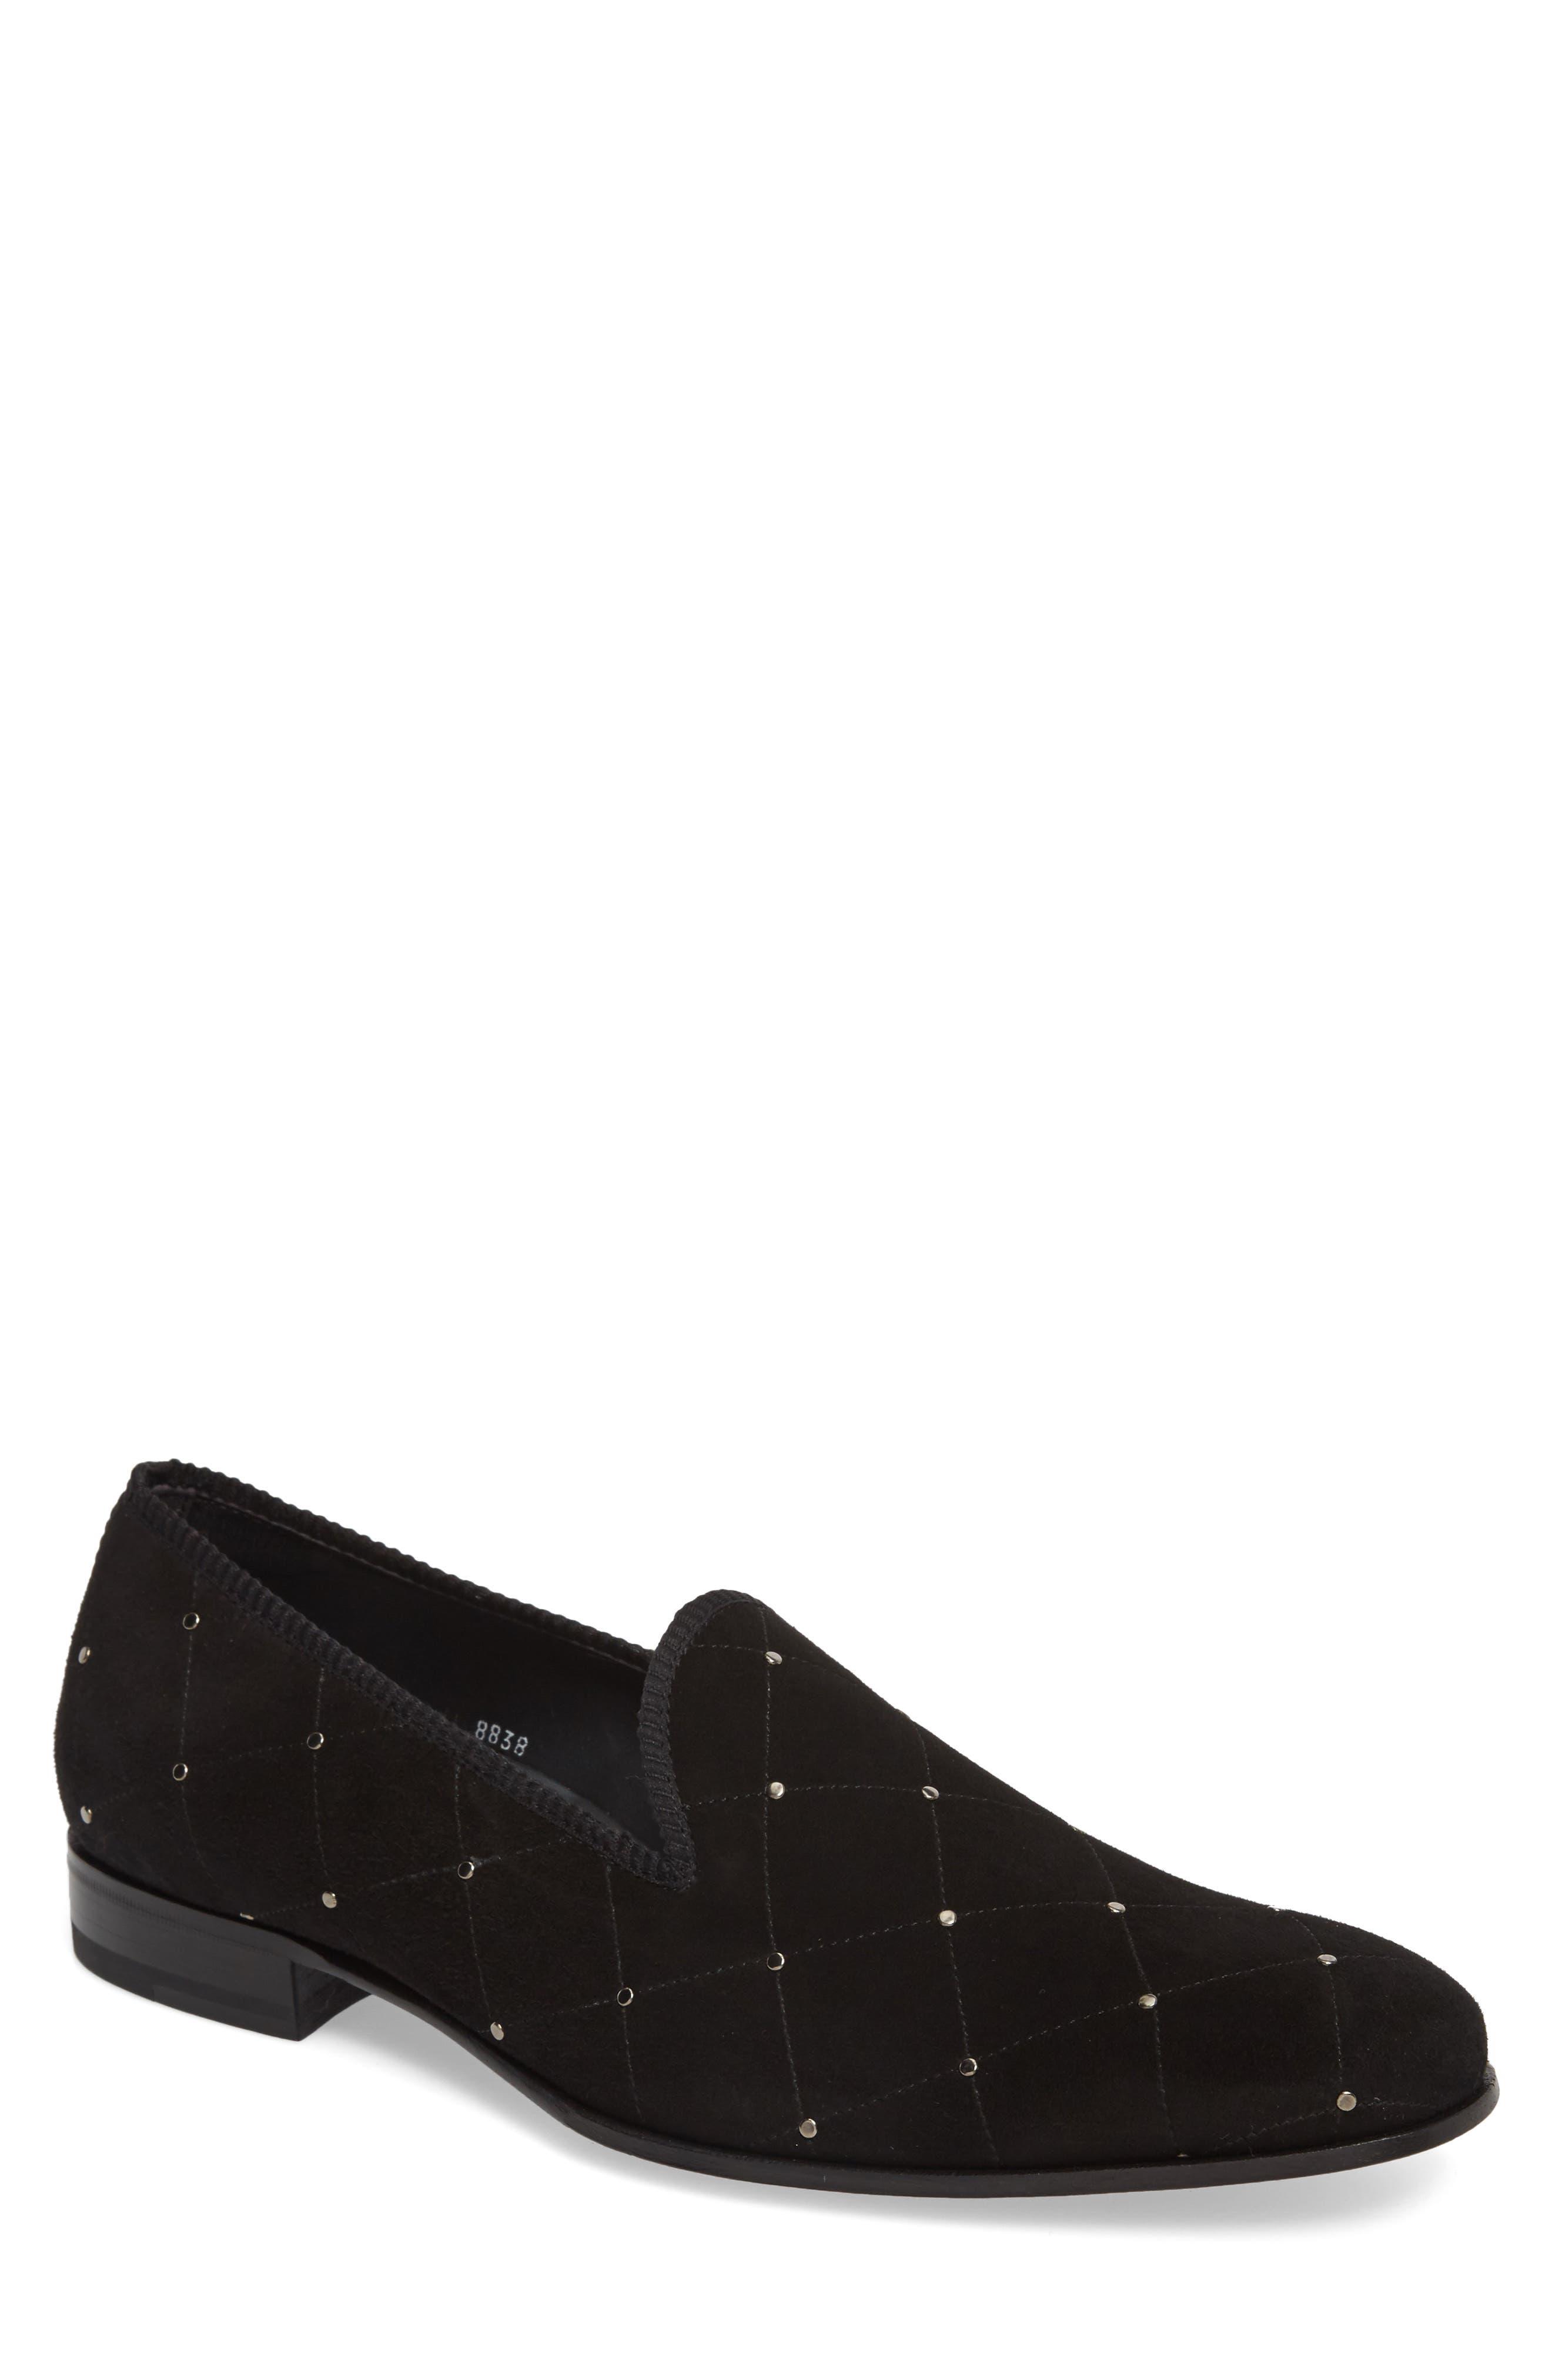 Talo Studded Venetian Loafer,                         Main,                         color, BLACK SUEDE